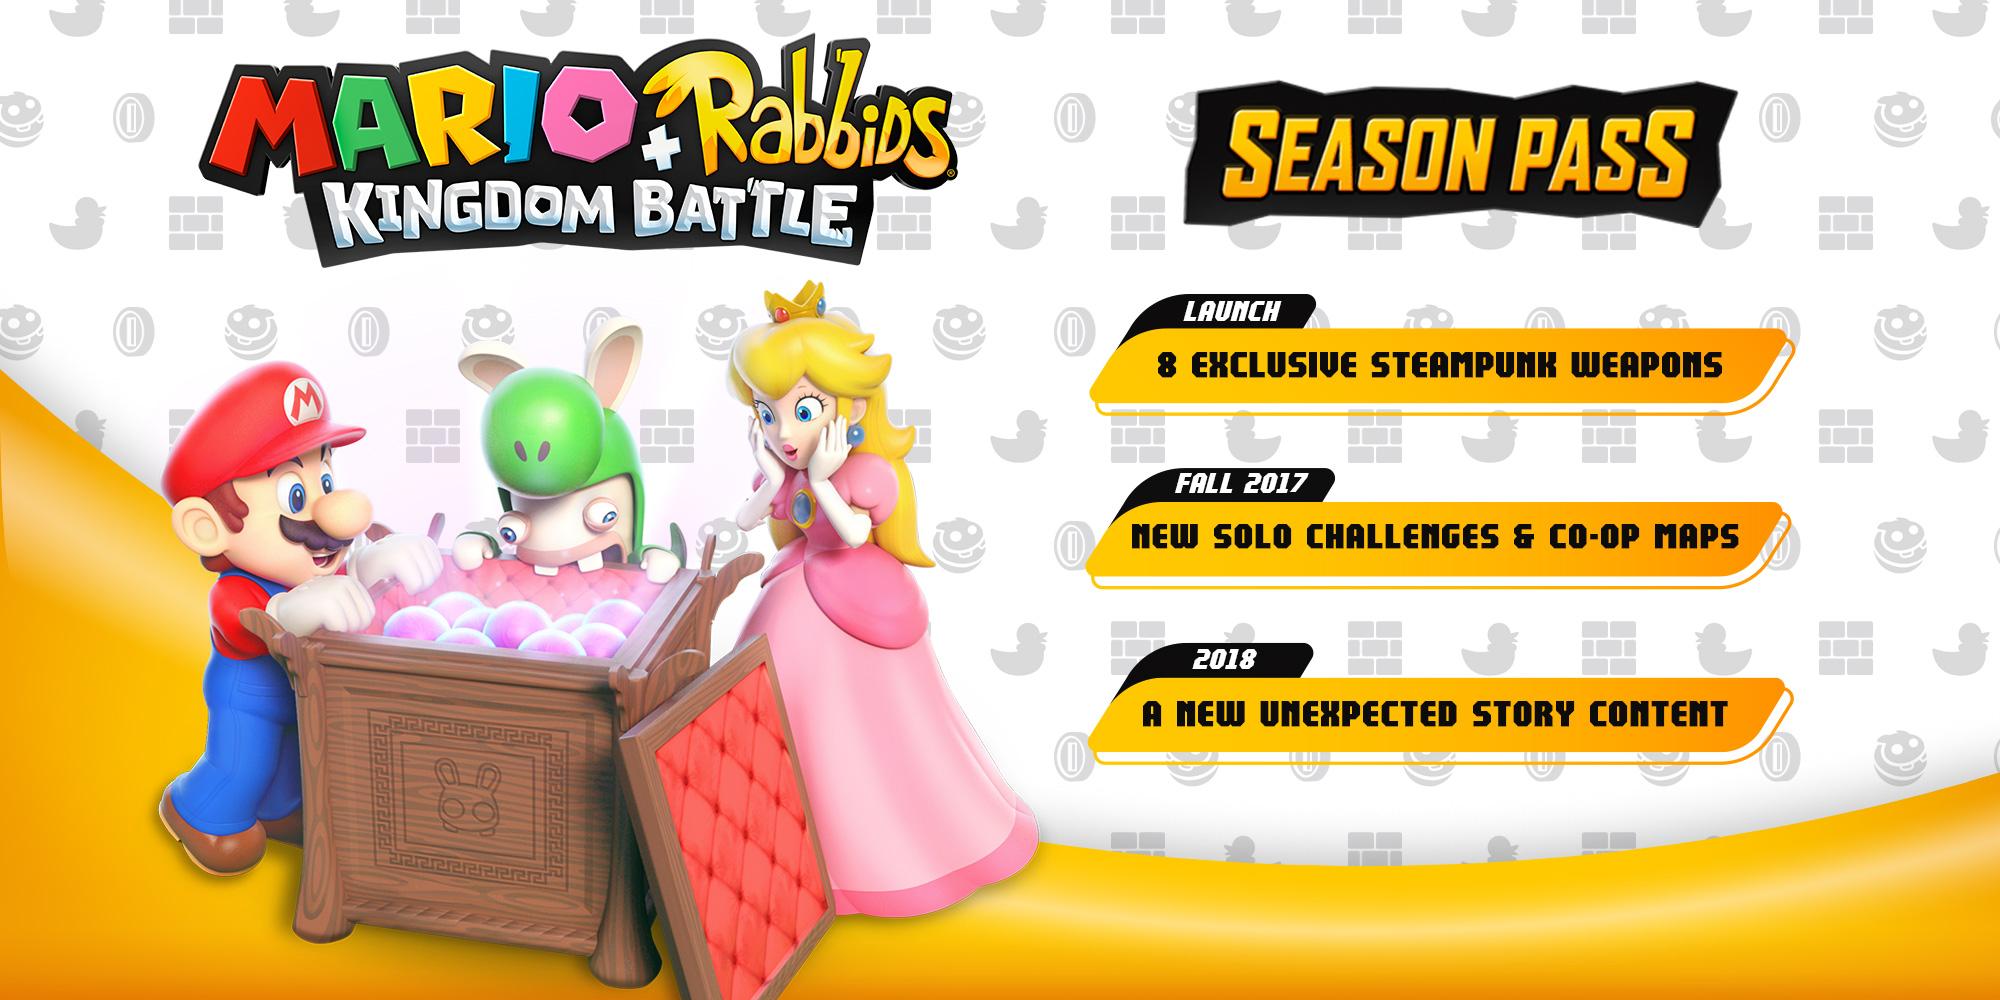 Mario + Rabbids Kingdom Battle getting Season Pass